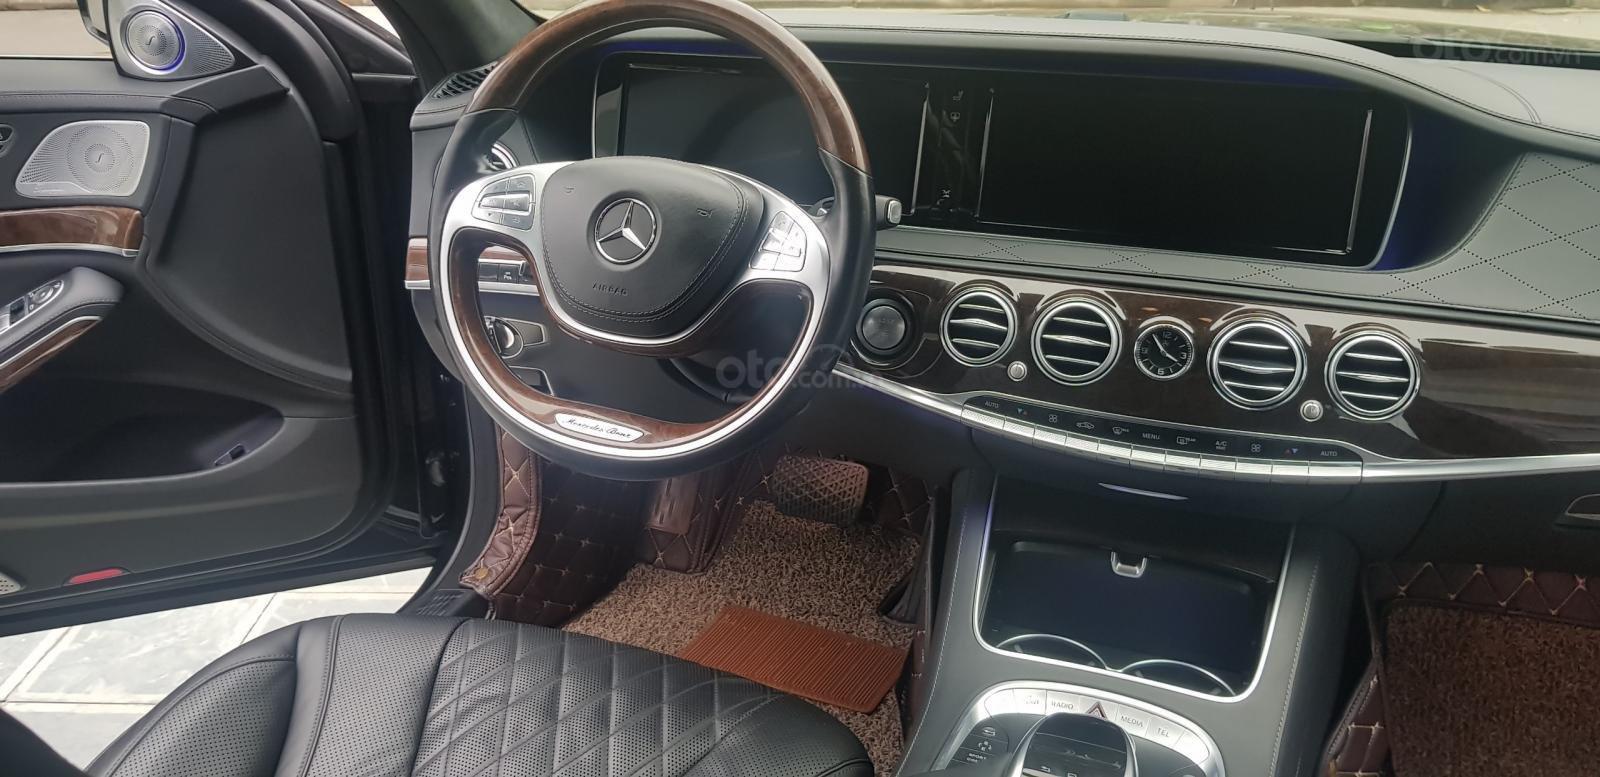 Bán Mercedes-Benz S500 SX 2016 màu đen, LH Ms  Hương 094.539.2468 (8)